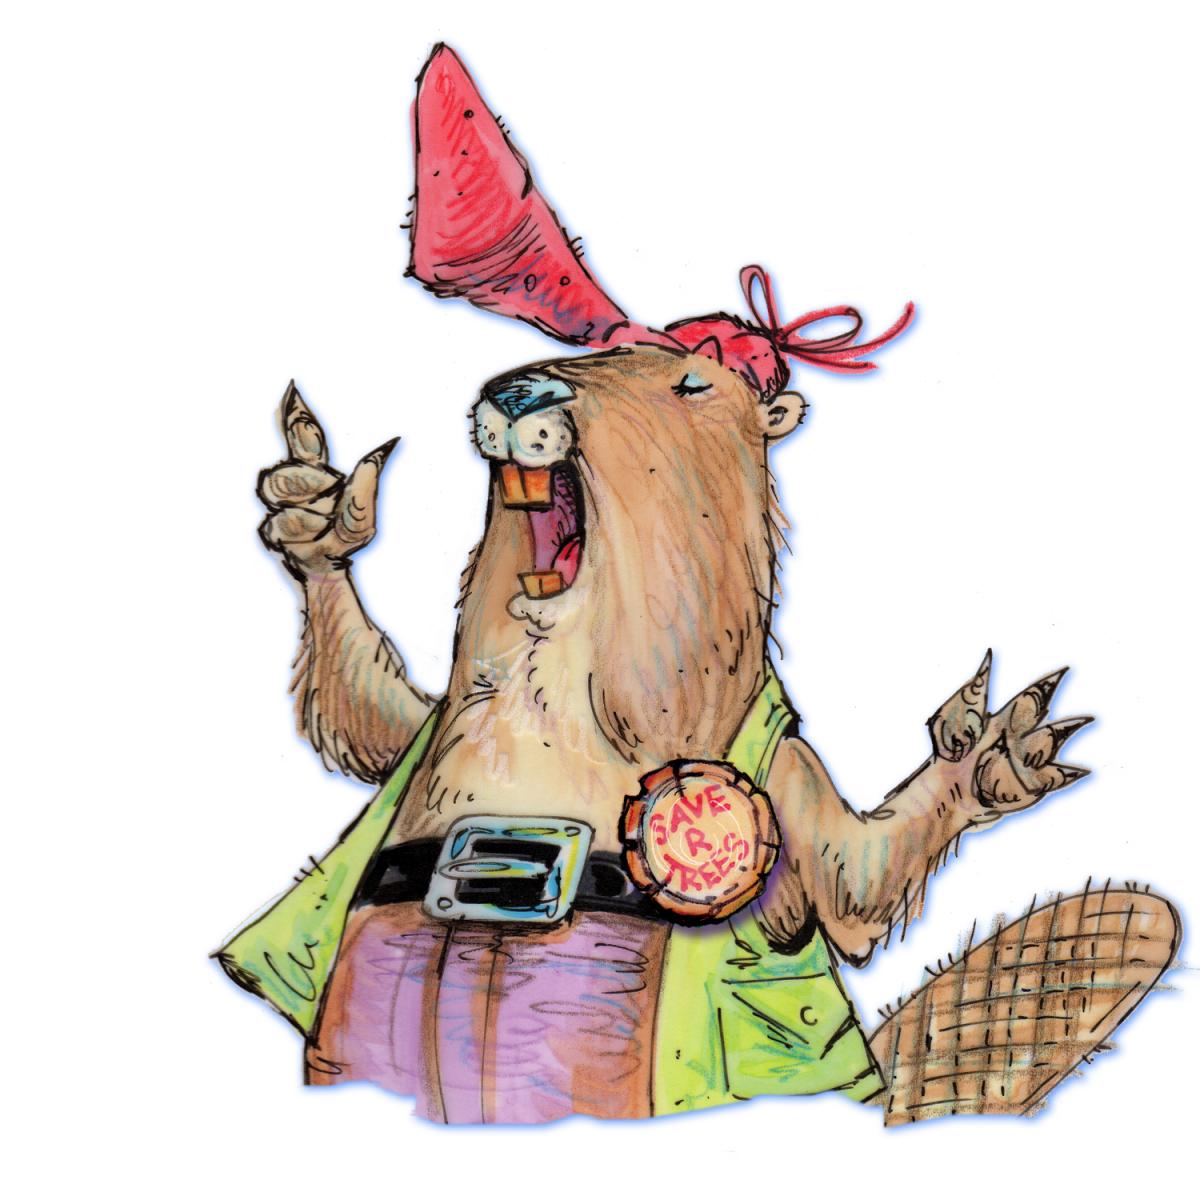 mouthy beaver